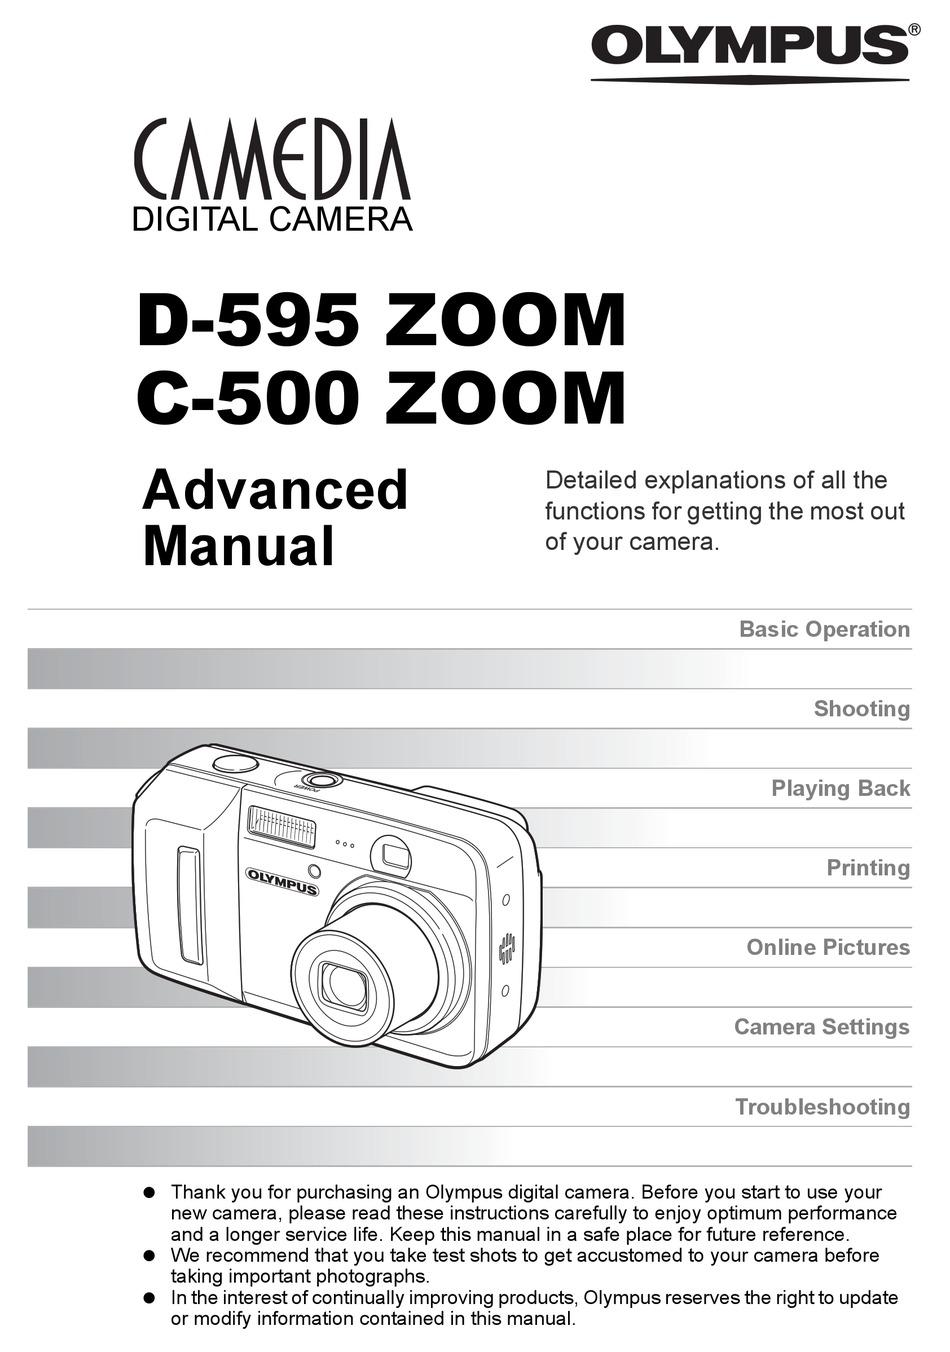 OLYMPUS CAMEDIA C-500 ZOOM ADVANCED MANUAL Pdf Download